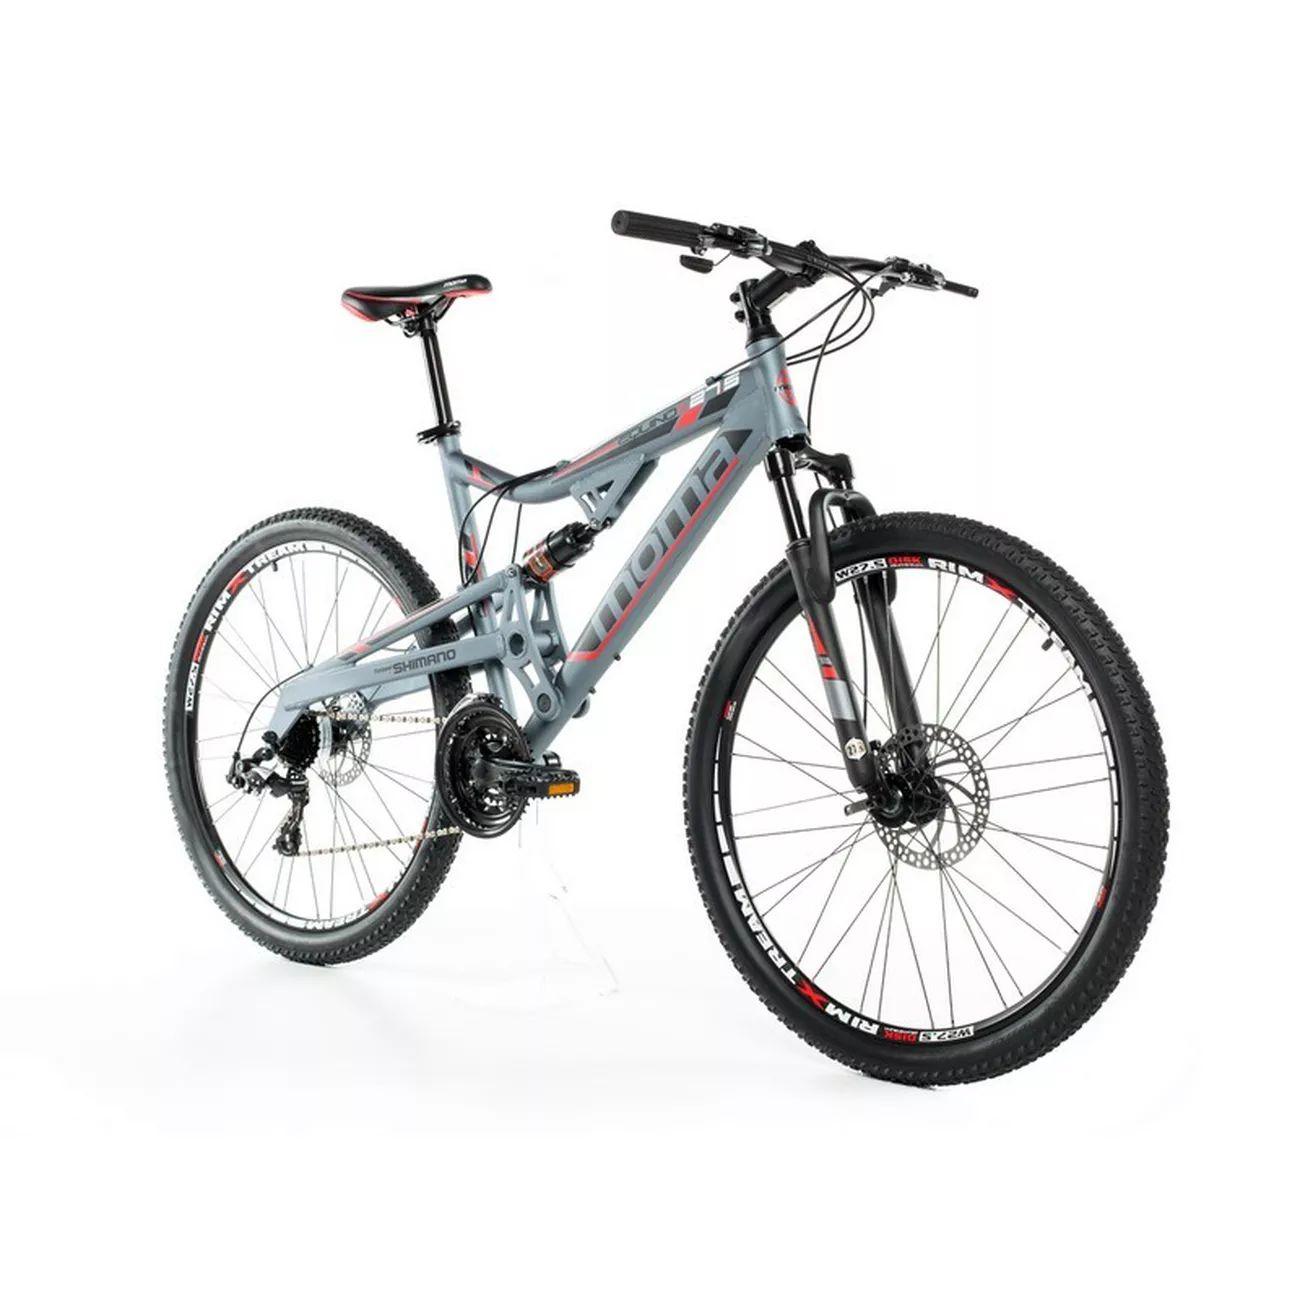 "Vélo VTT 27.5"" Cycle Momabikes EQX (Vendeur Tiers)"